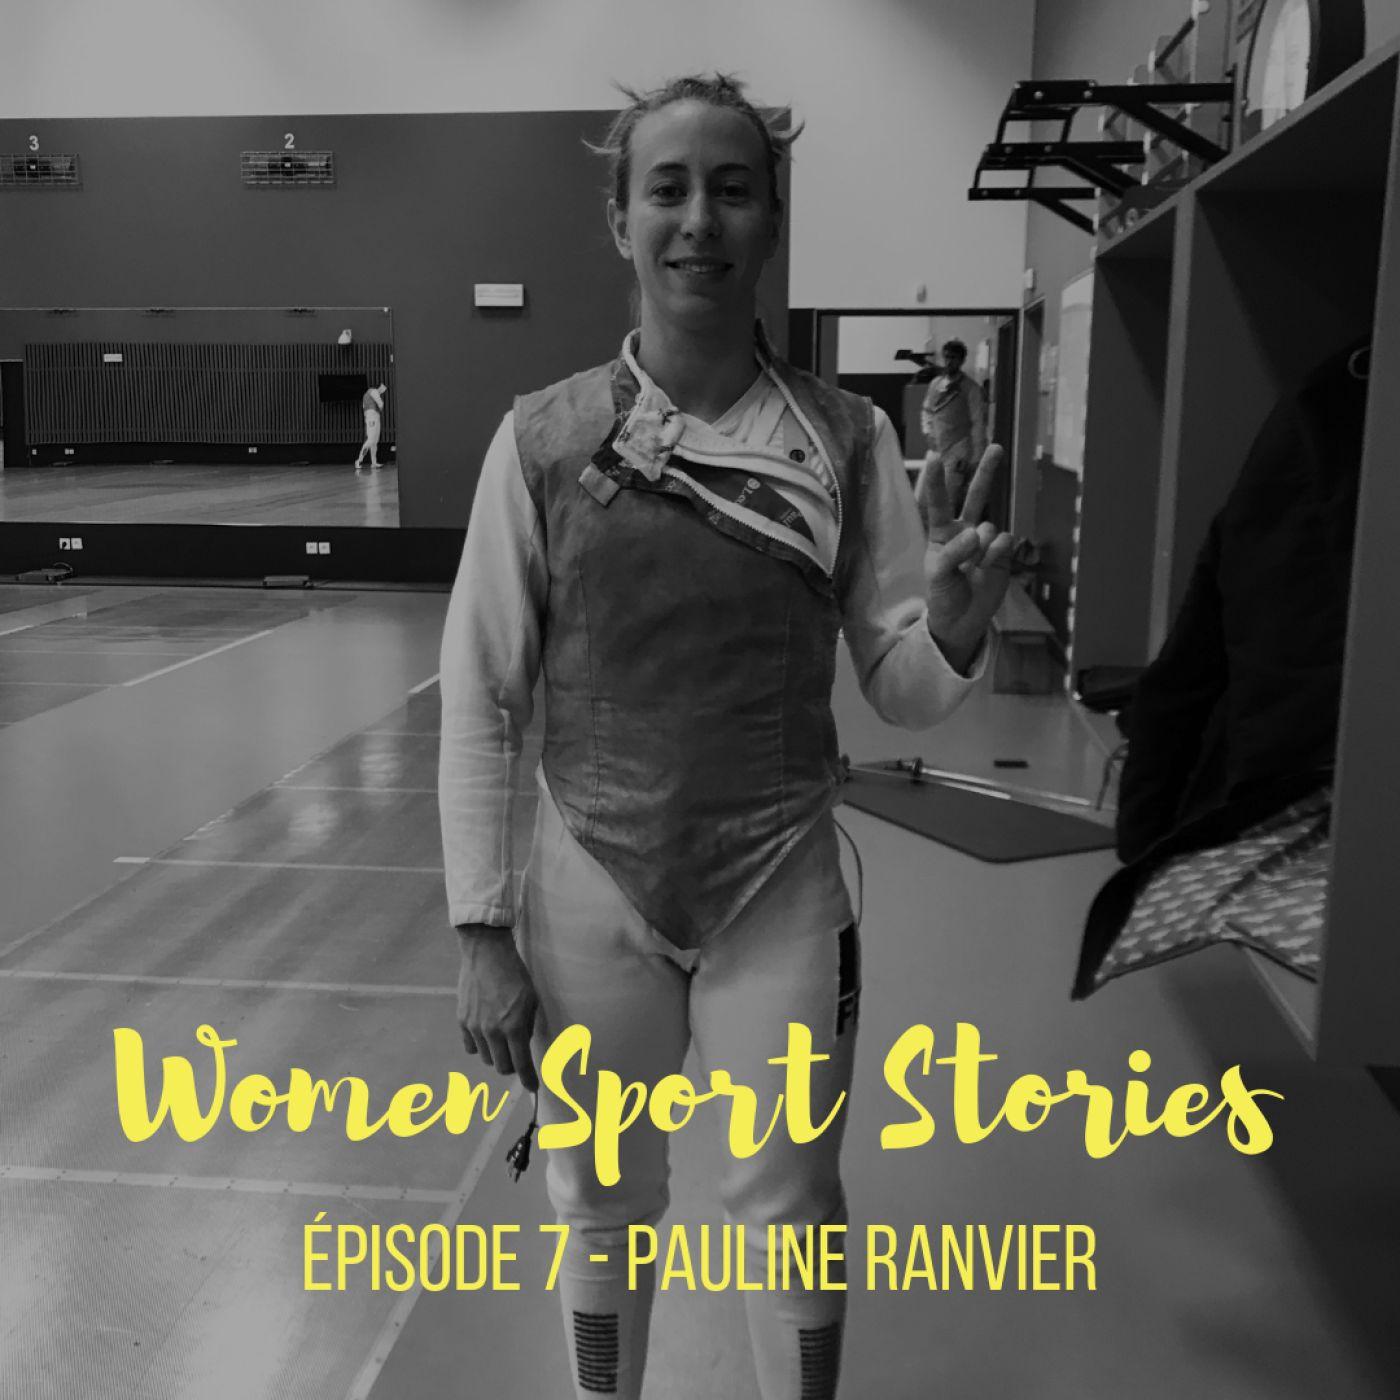 Episode 7 : Pauline Ranvier